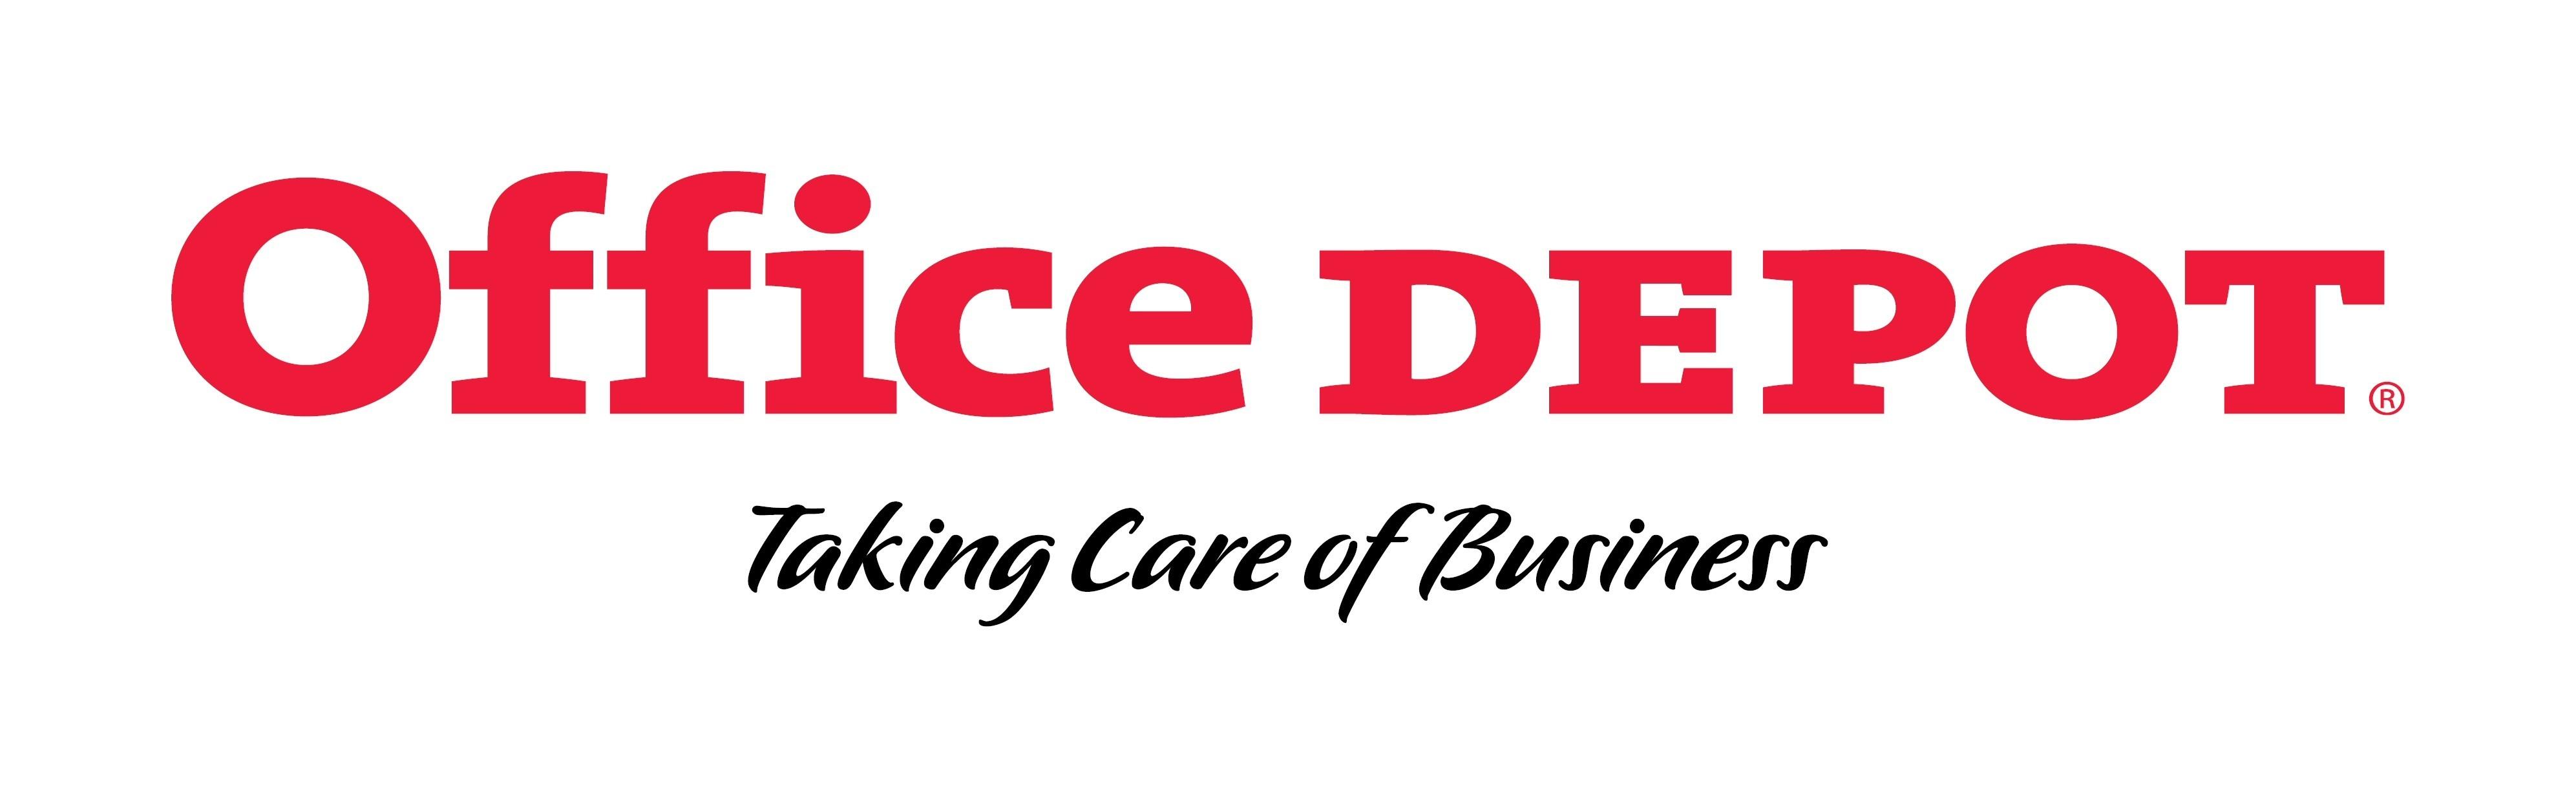 Office depot credit card payment login address - Office depot customer service phone number ...